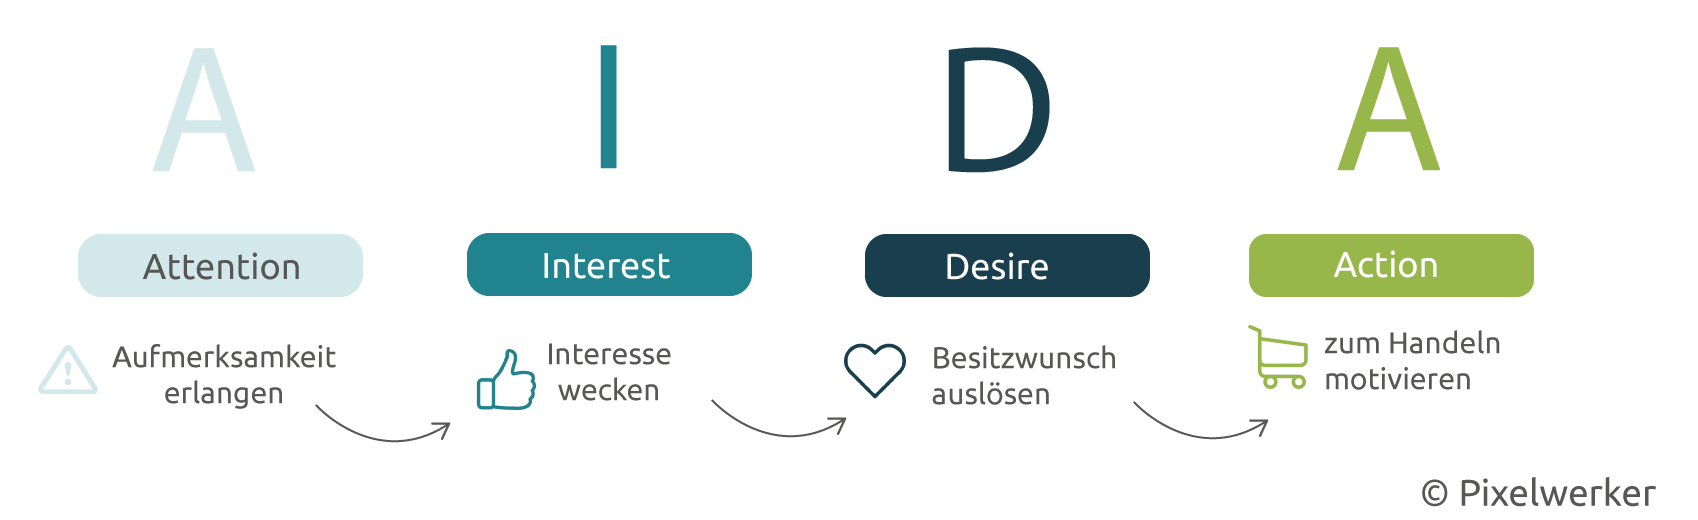 AIDA-Prinzip